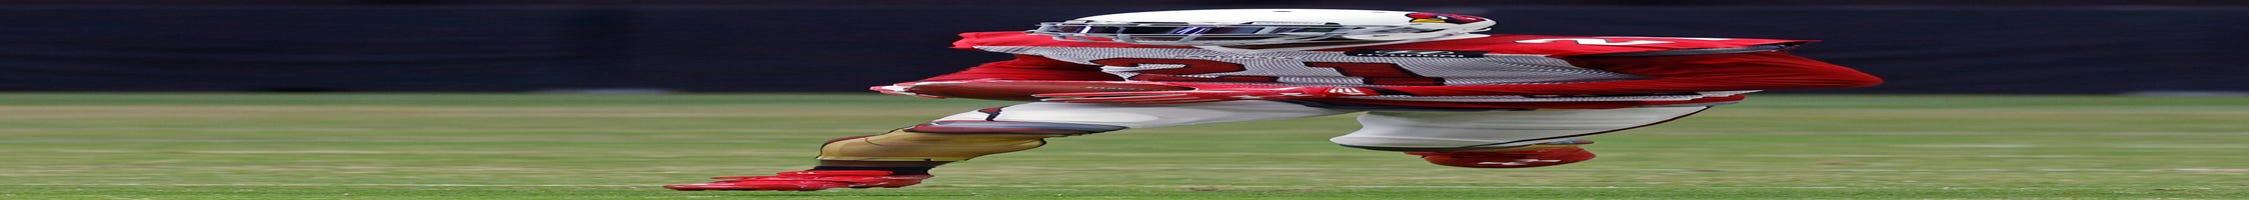 Cardinals QB Carson Palmer evaluated by DBs